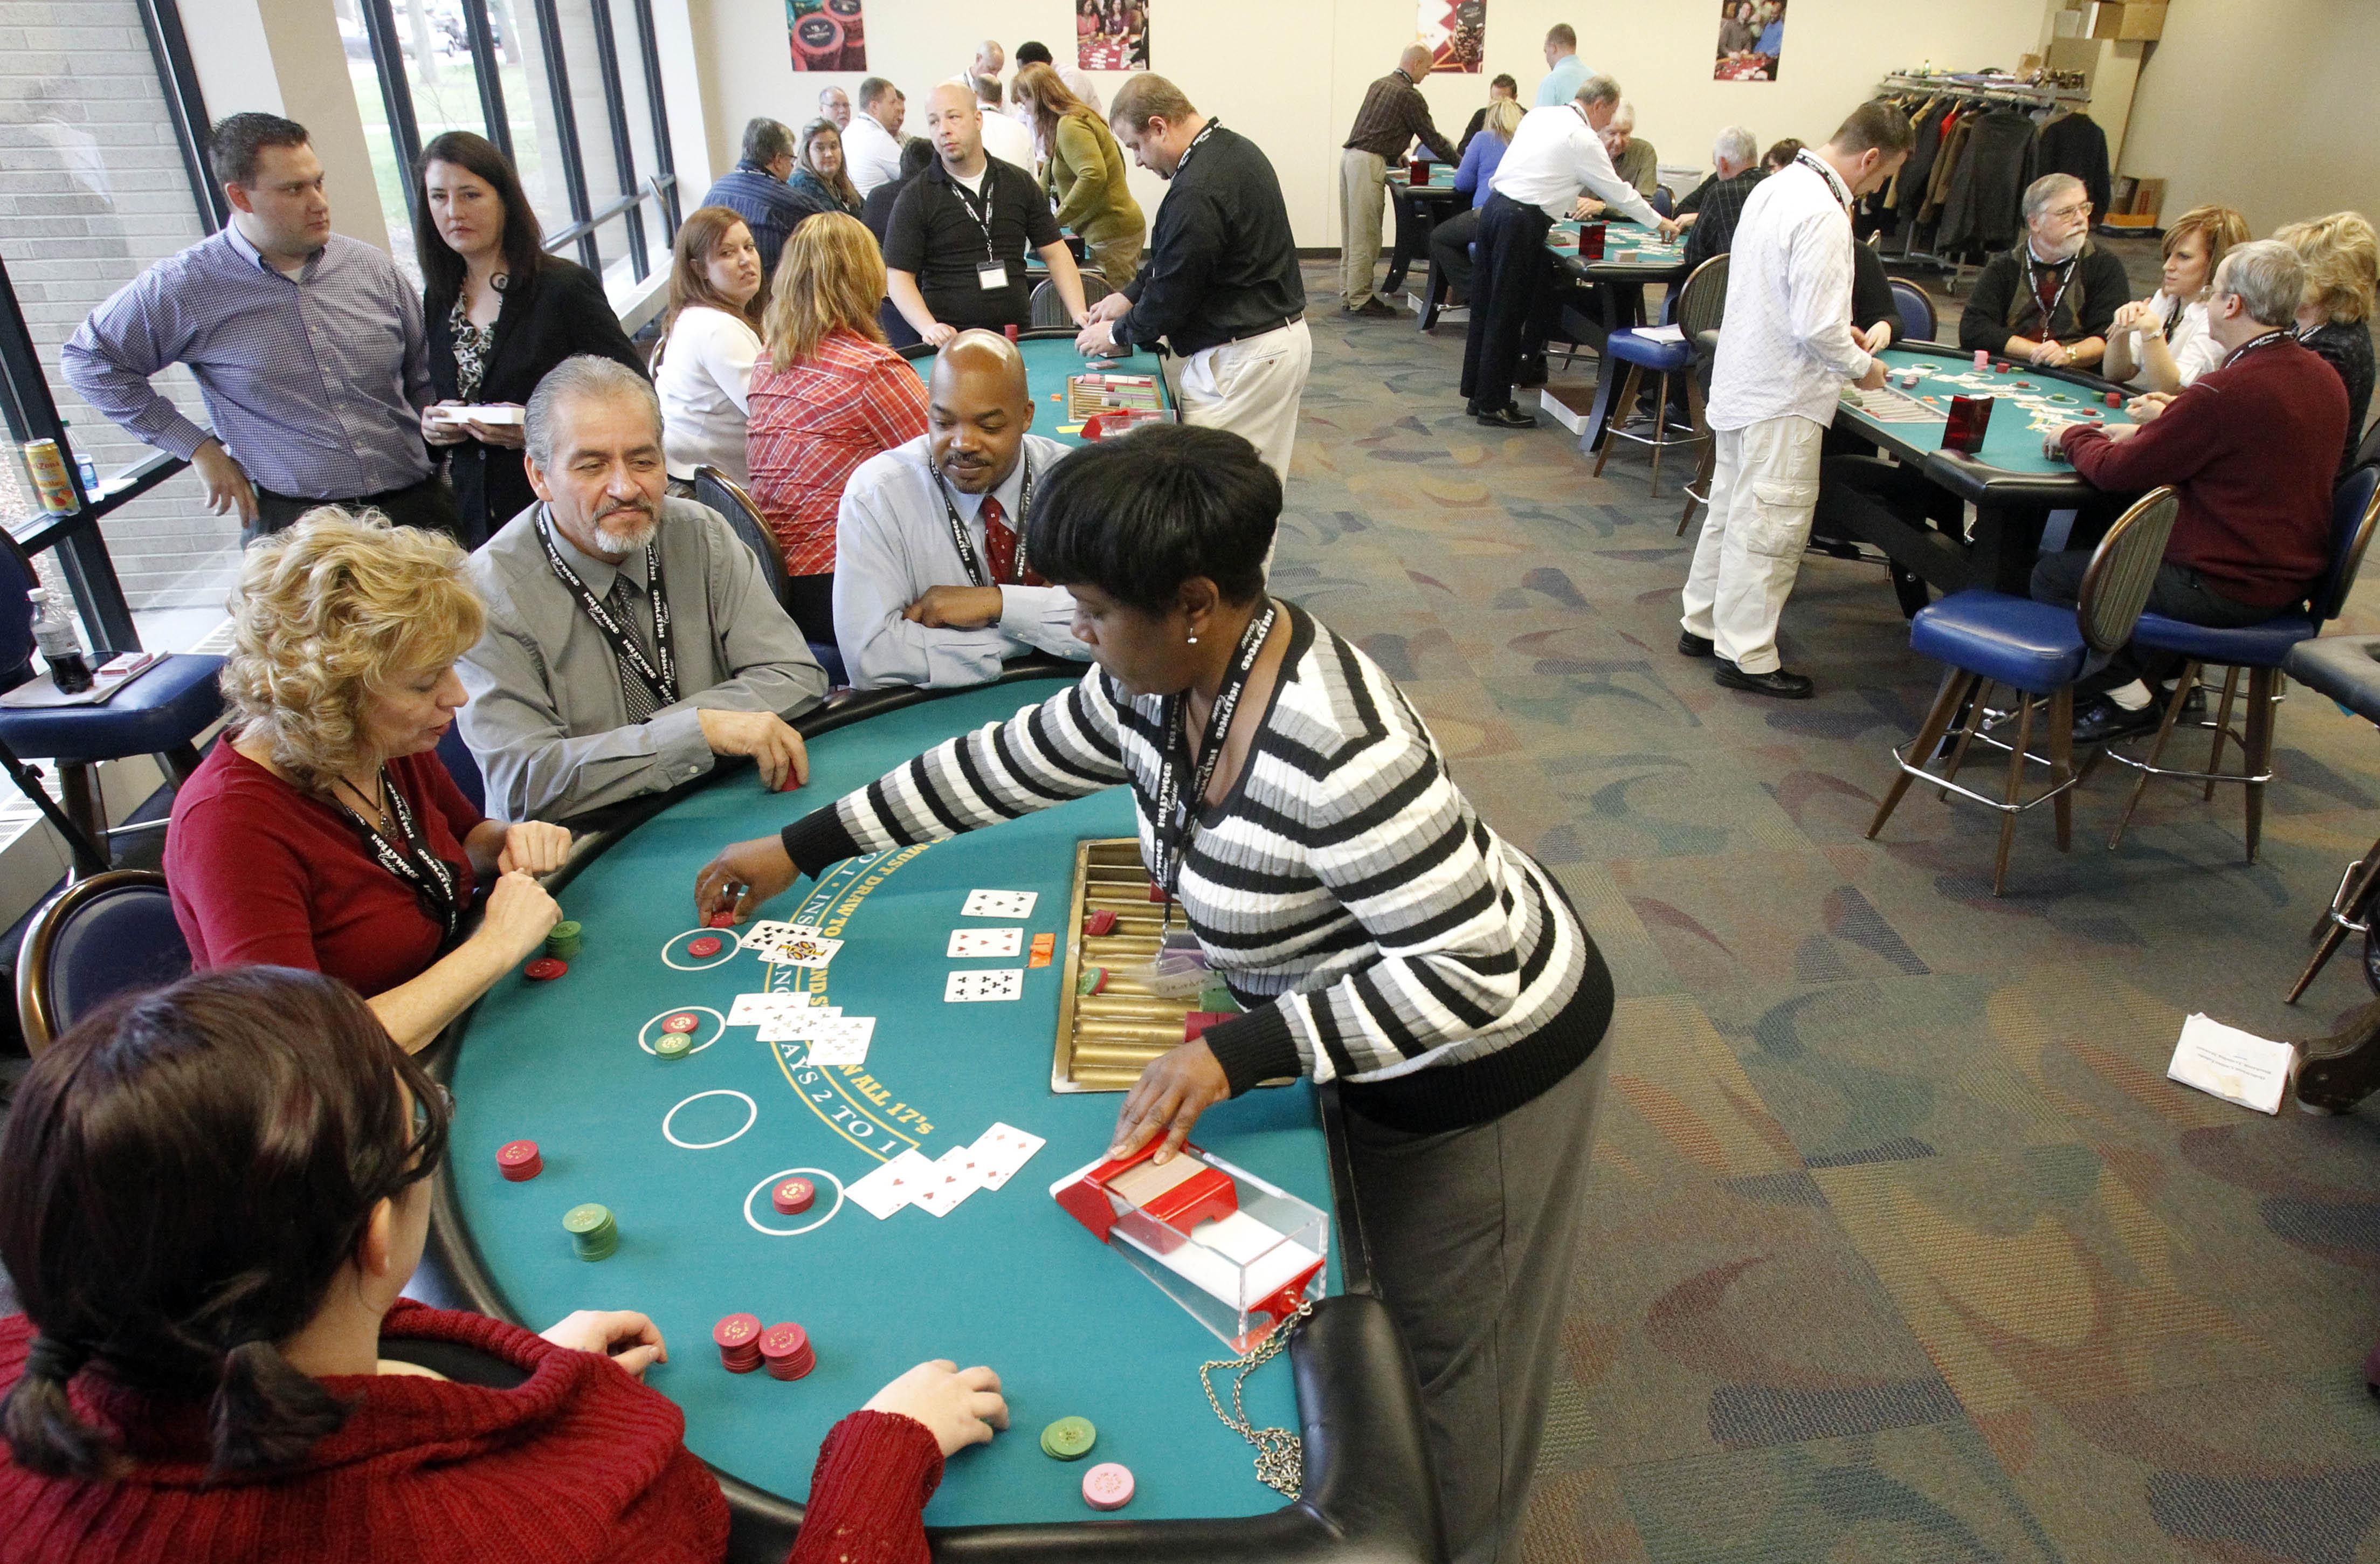 Nh casino bill